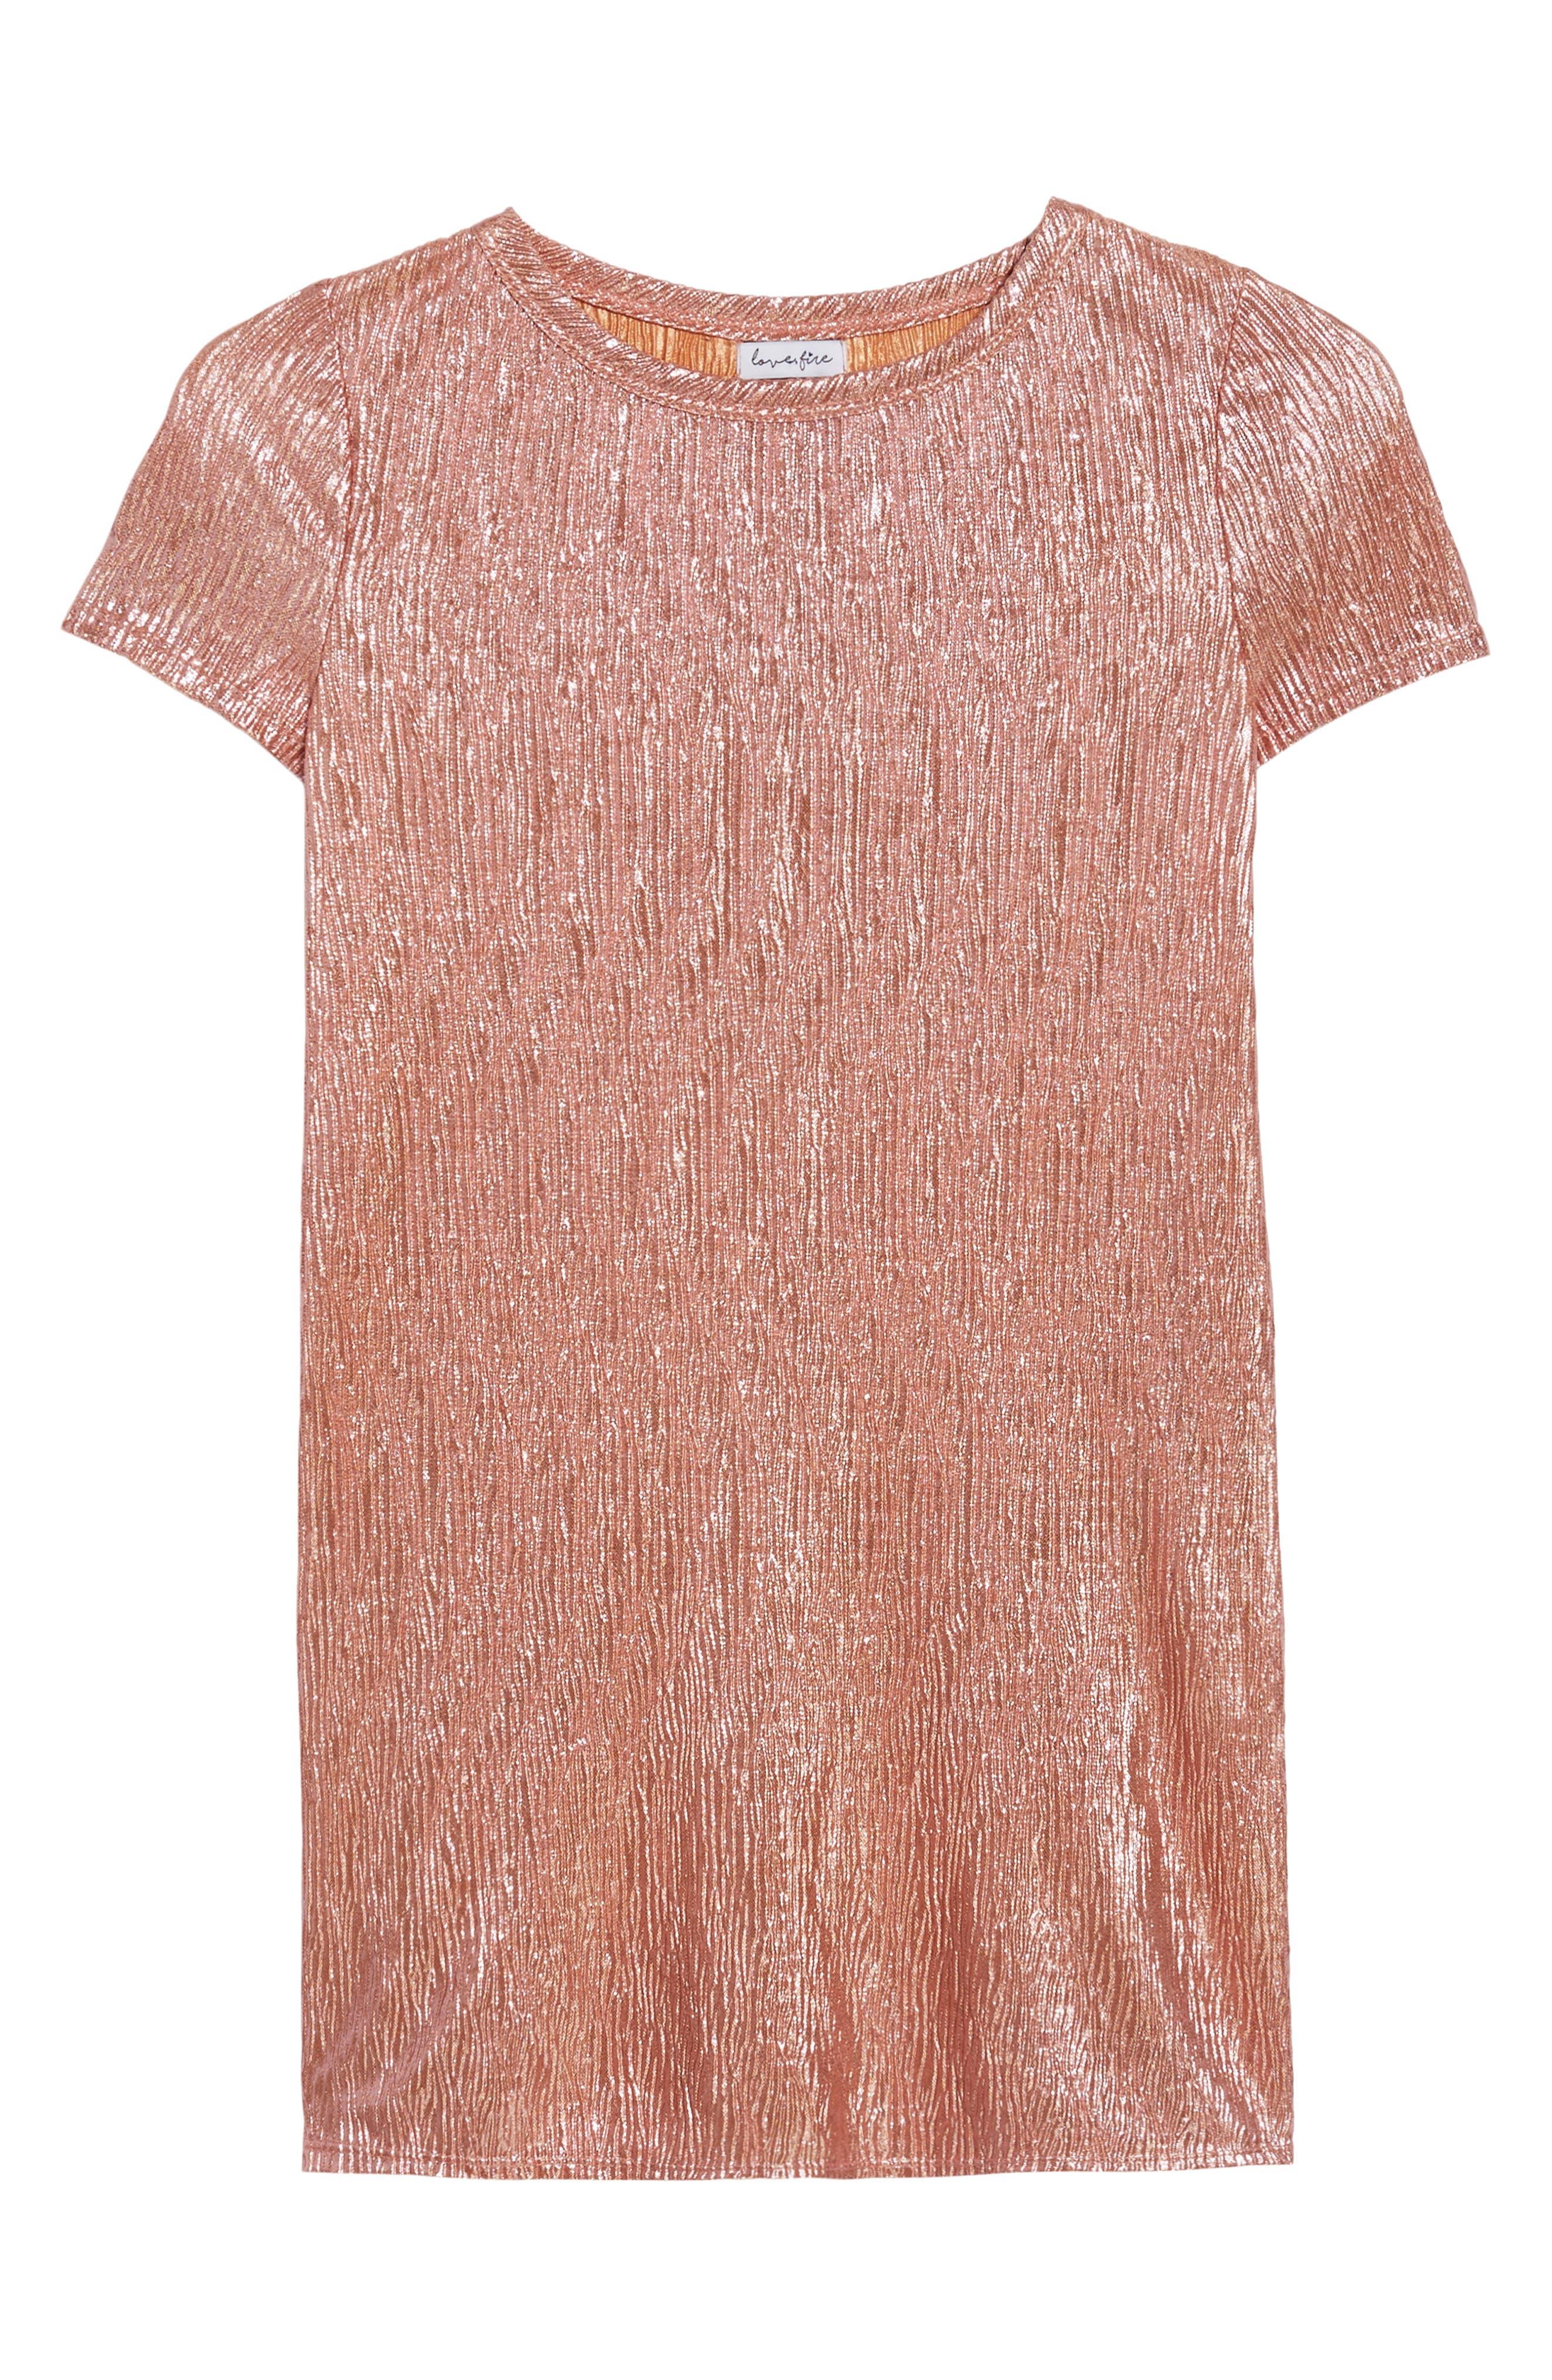 Main Image - Love Fire Crinkled Metallic T-Shirt Dress (Big Girls)